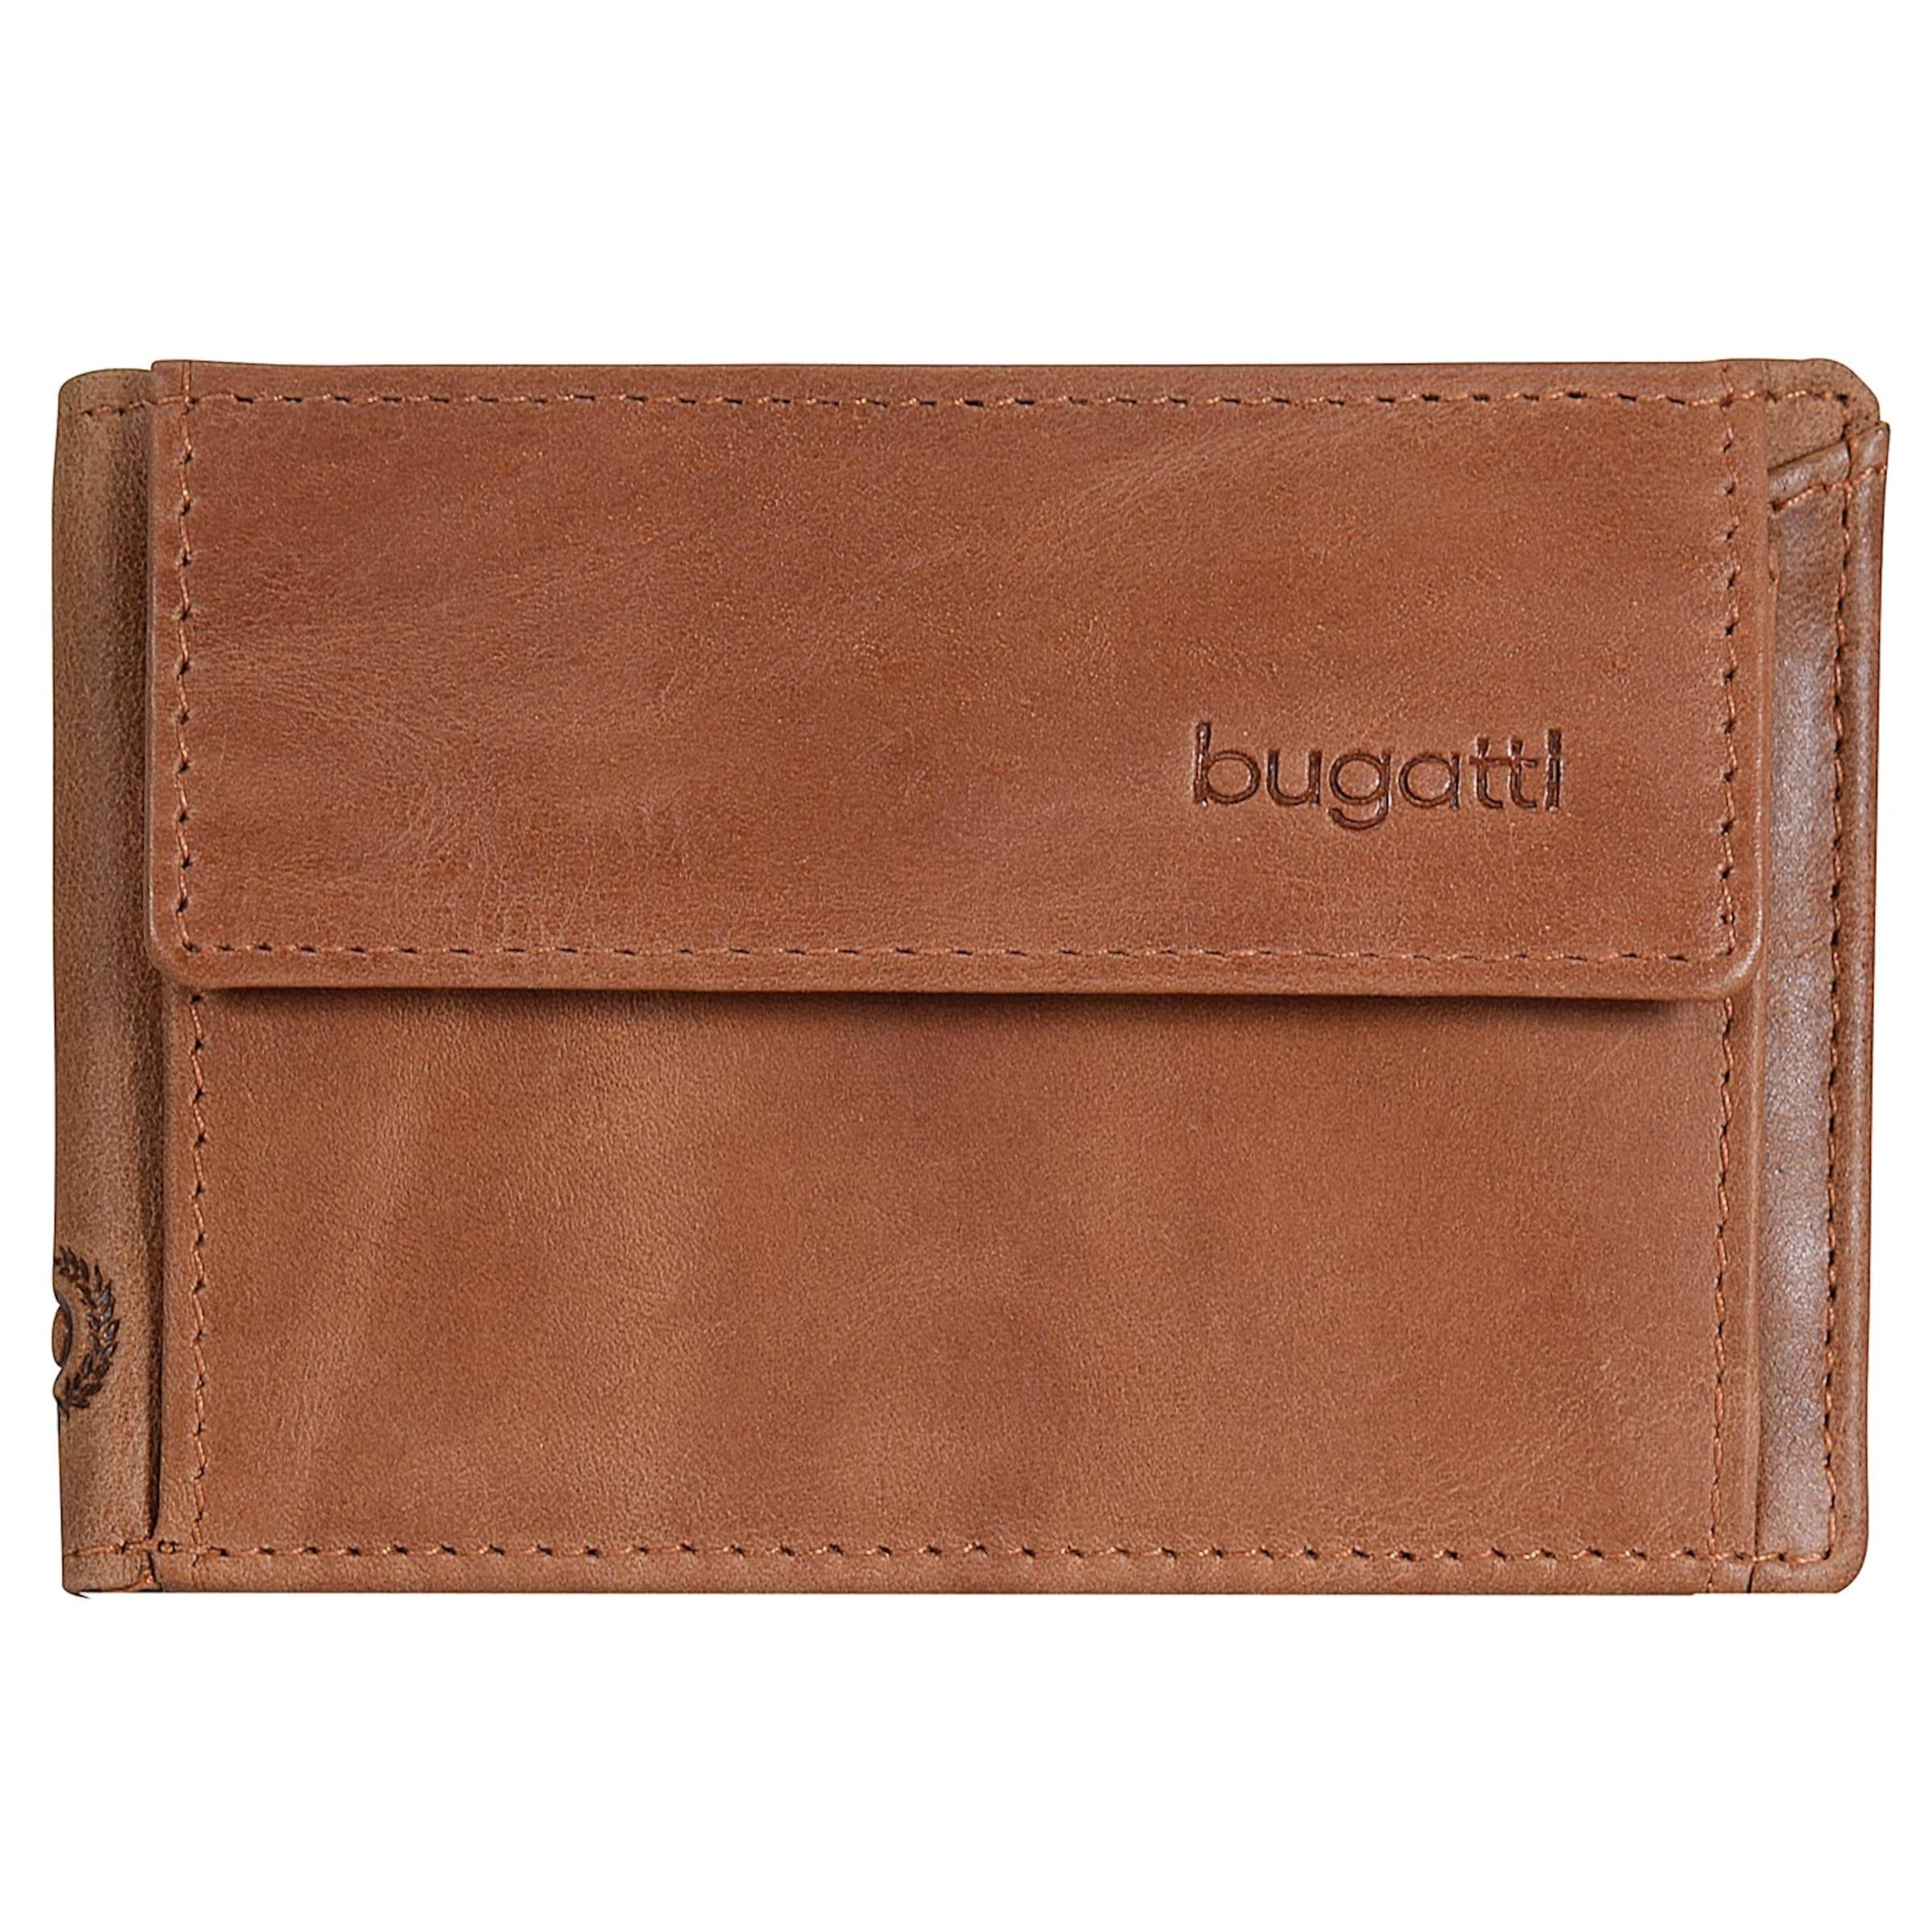 'volo' Cognac Bugatti In Bugatti Geldbörse VpqSzUM